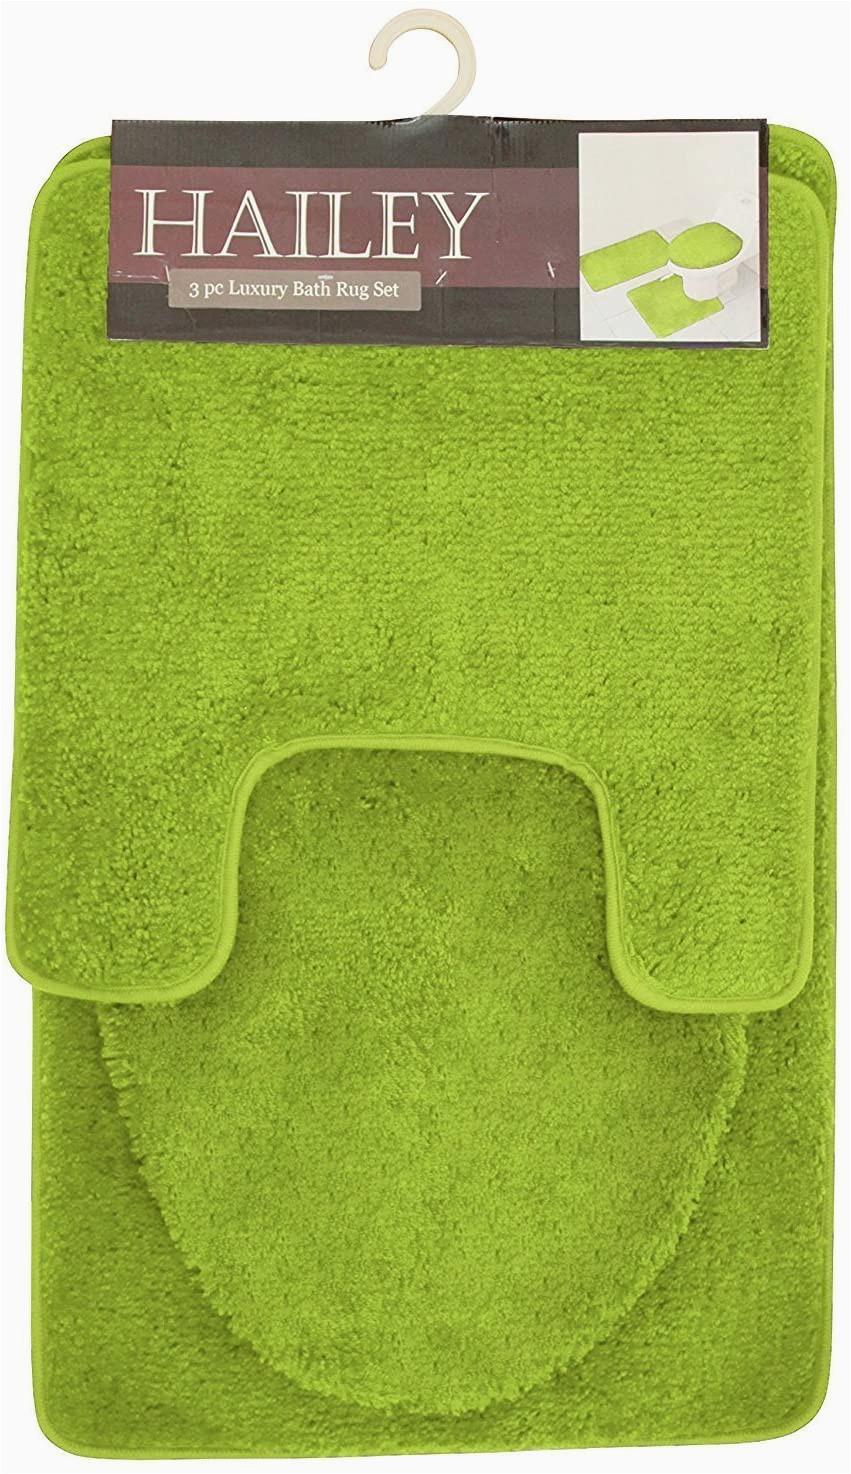 Bathroom Rug Set Green Hailey 3 Piece Bath Rug Set Lime